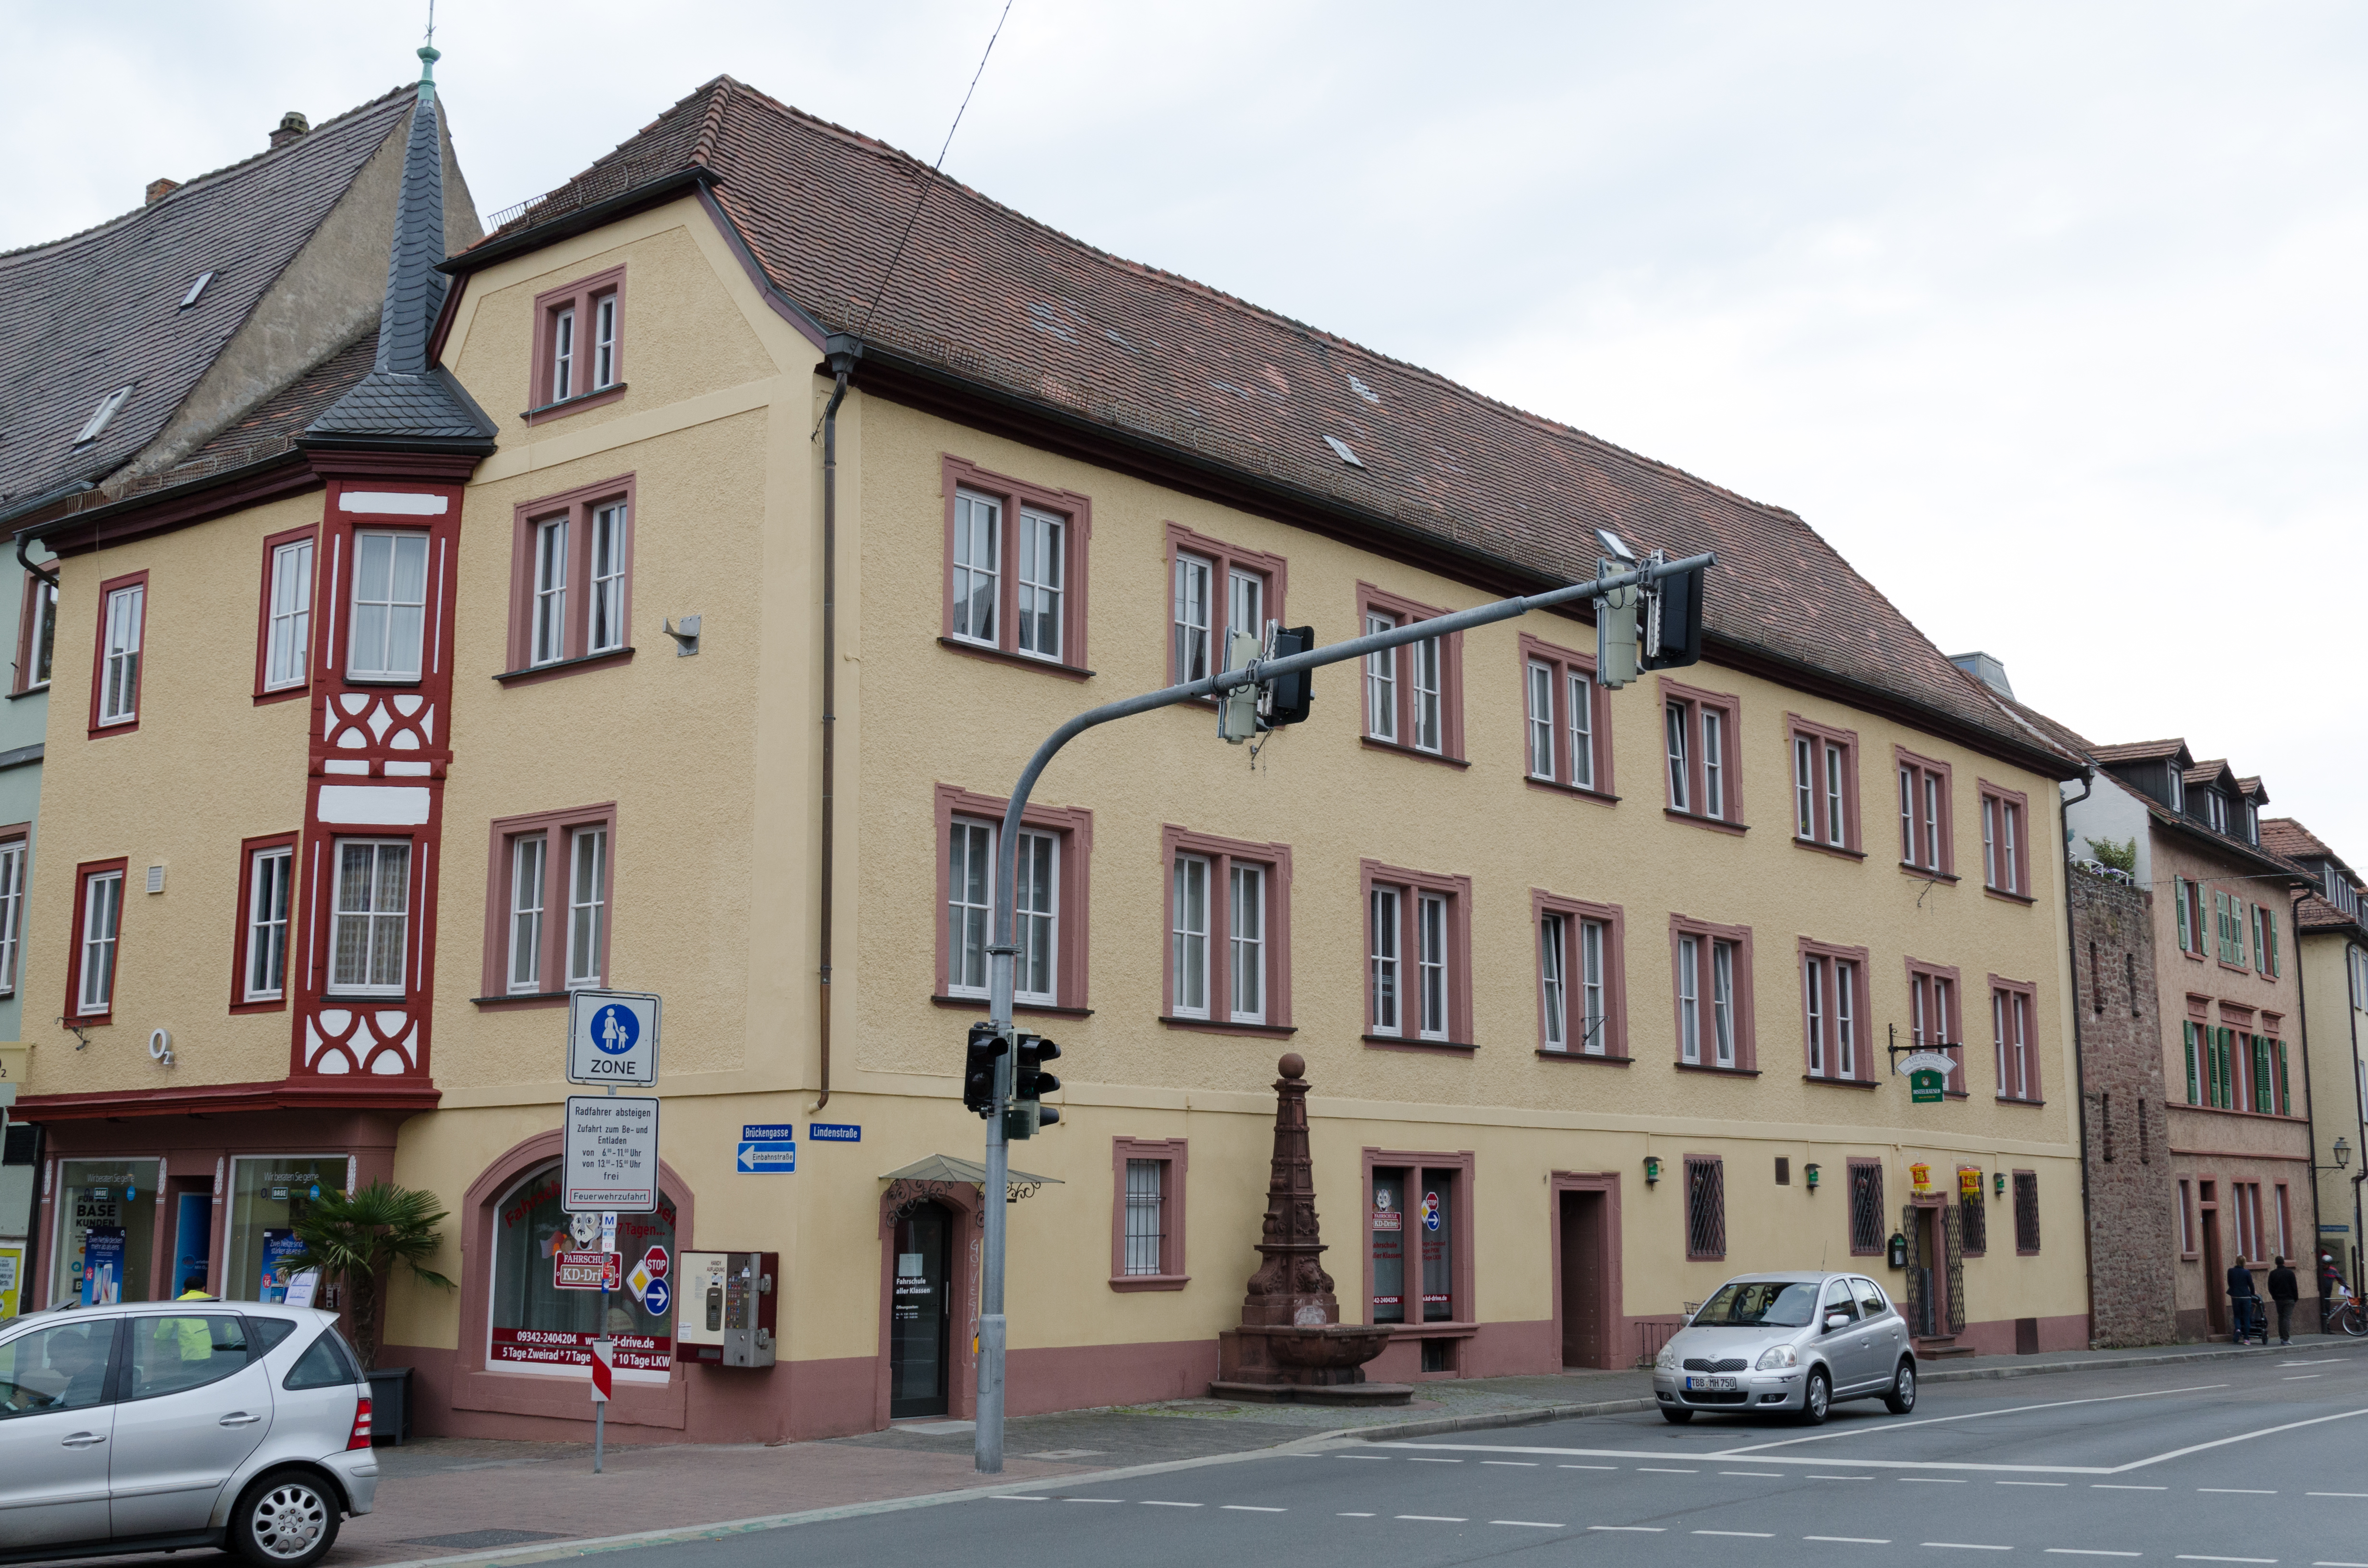 Lindenstraße One